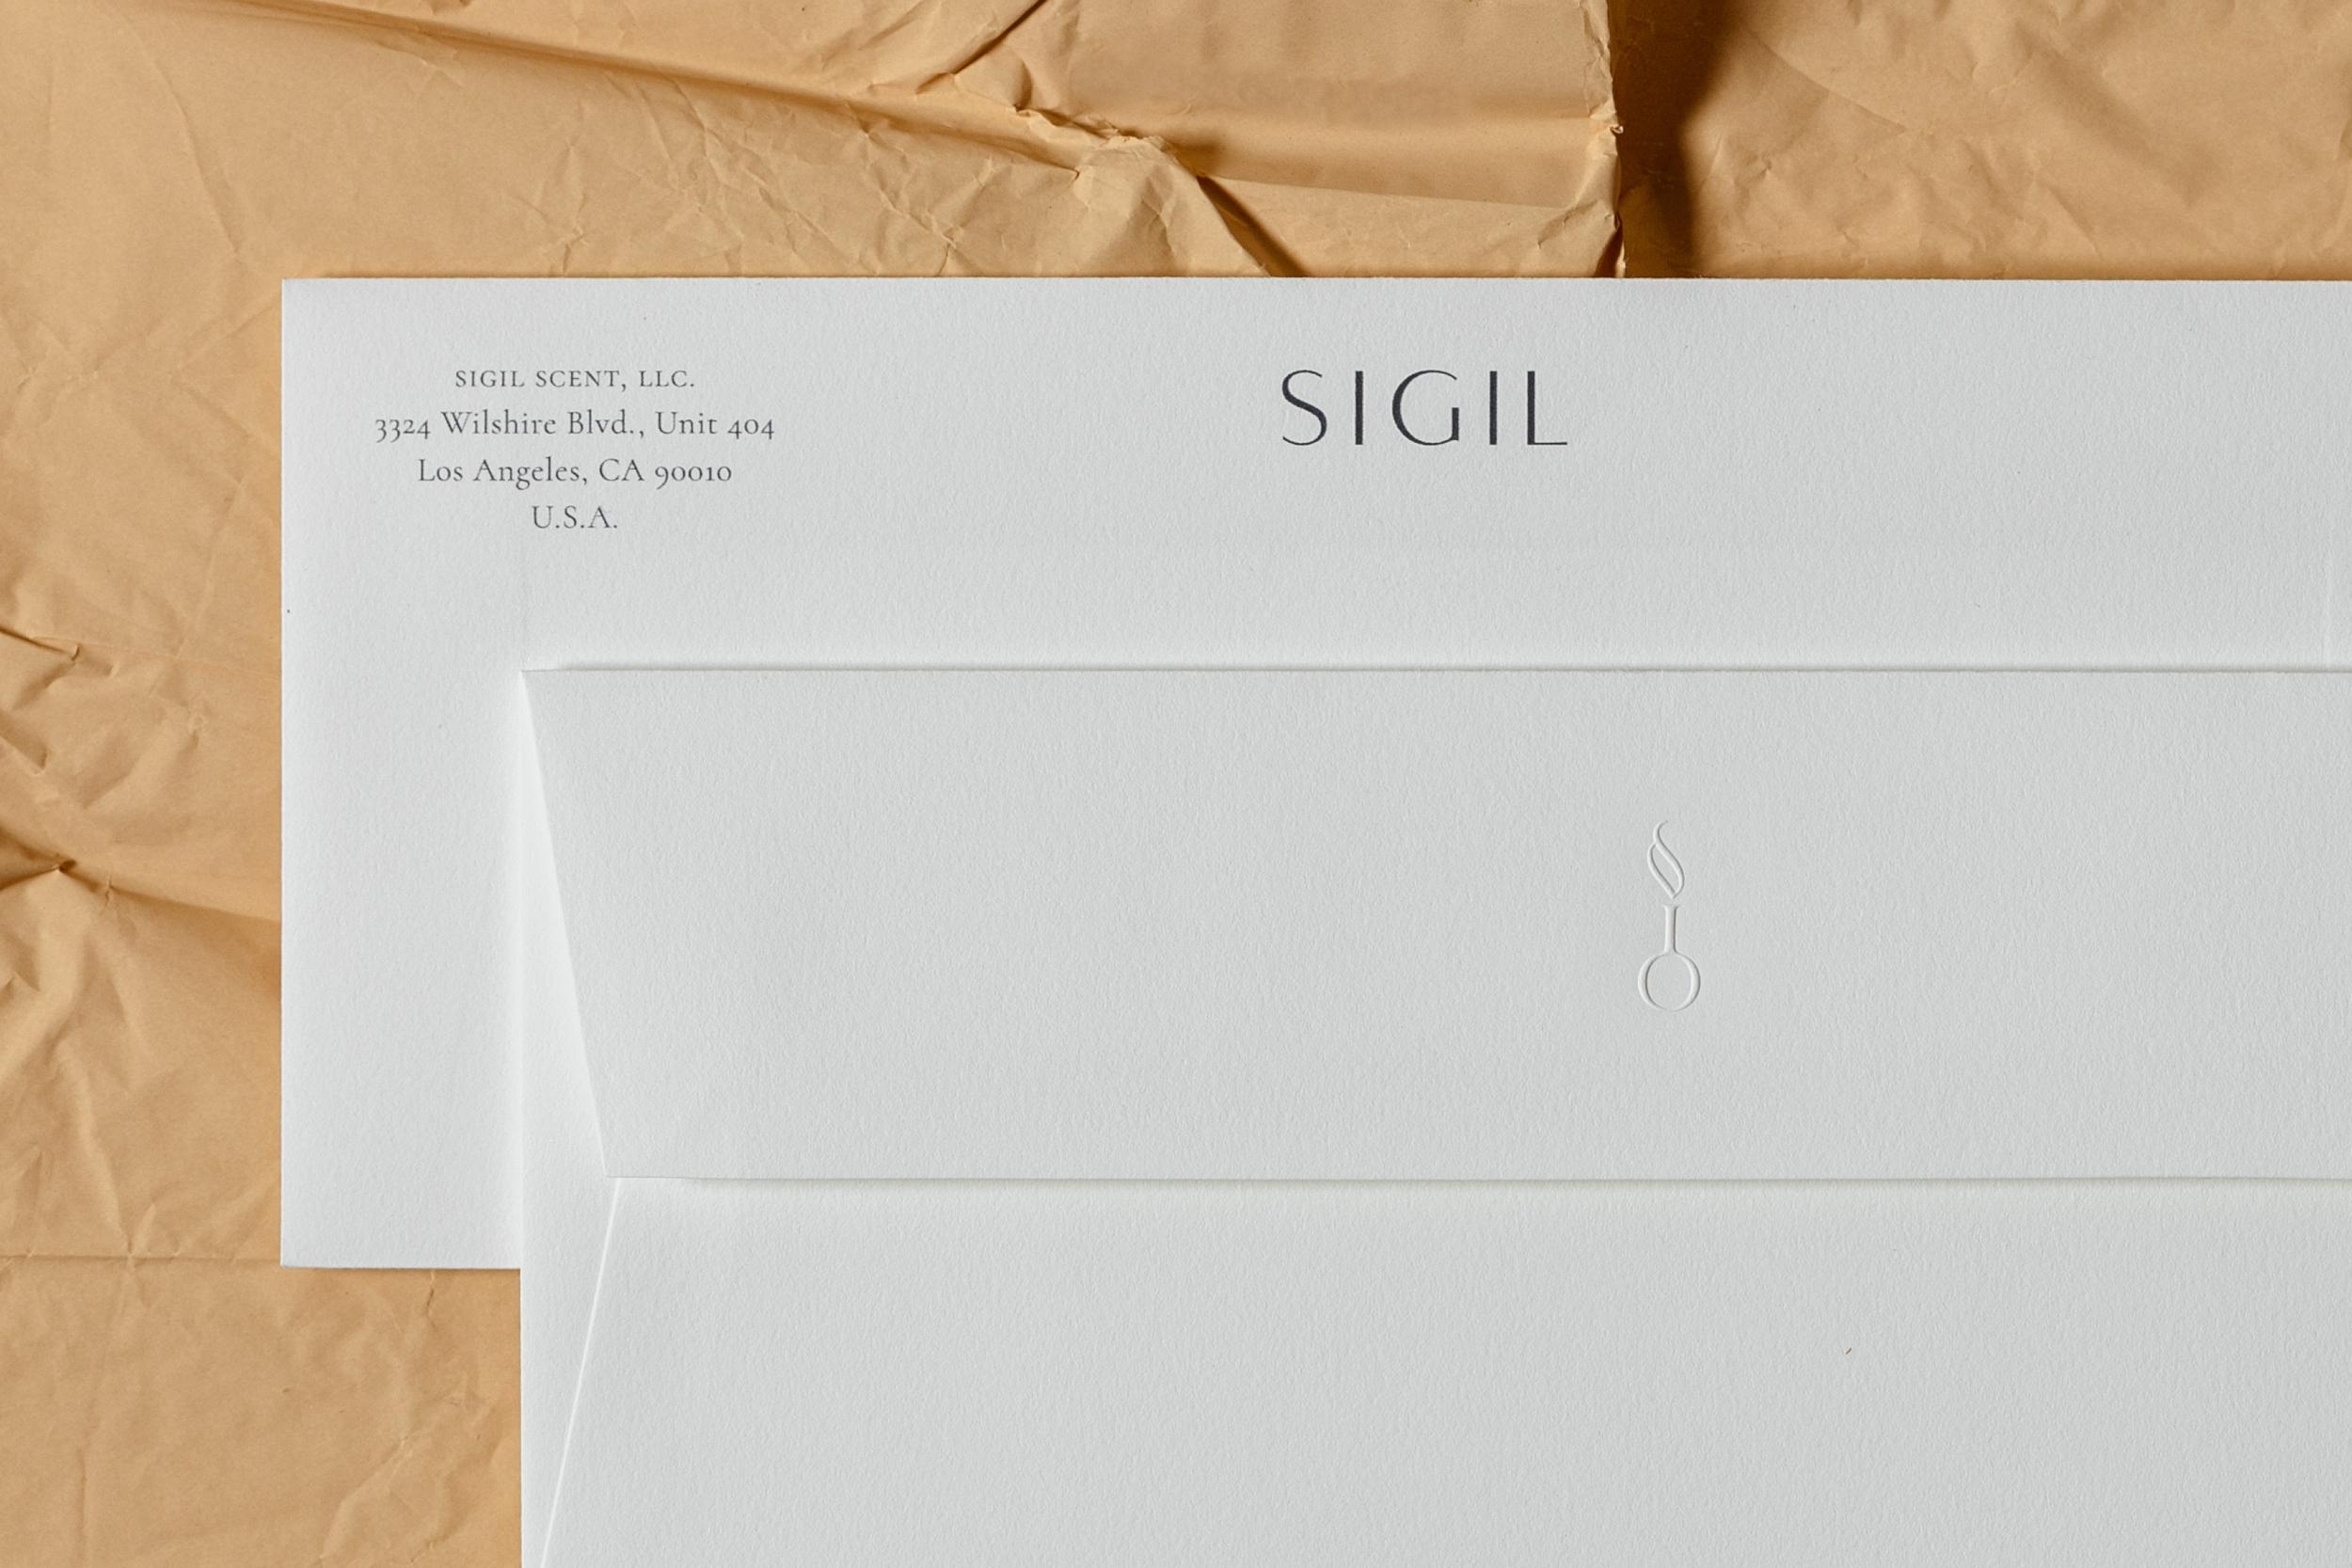 Sigil-envelope.jpg